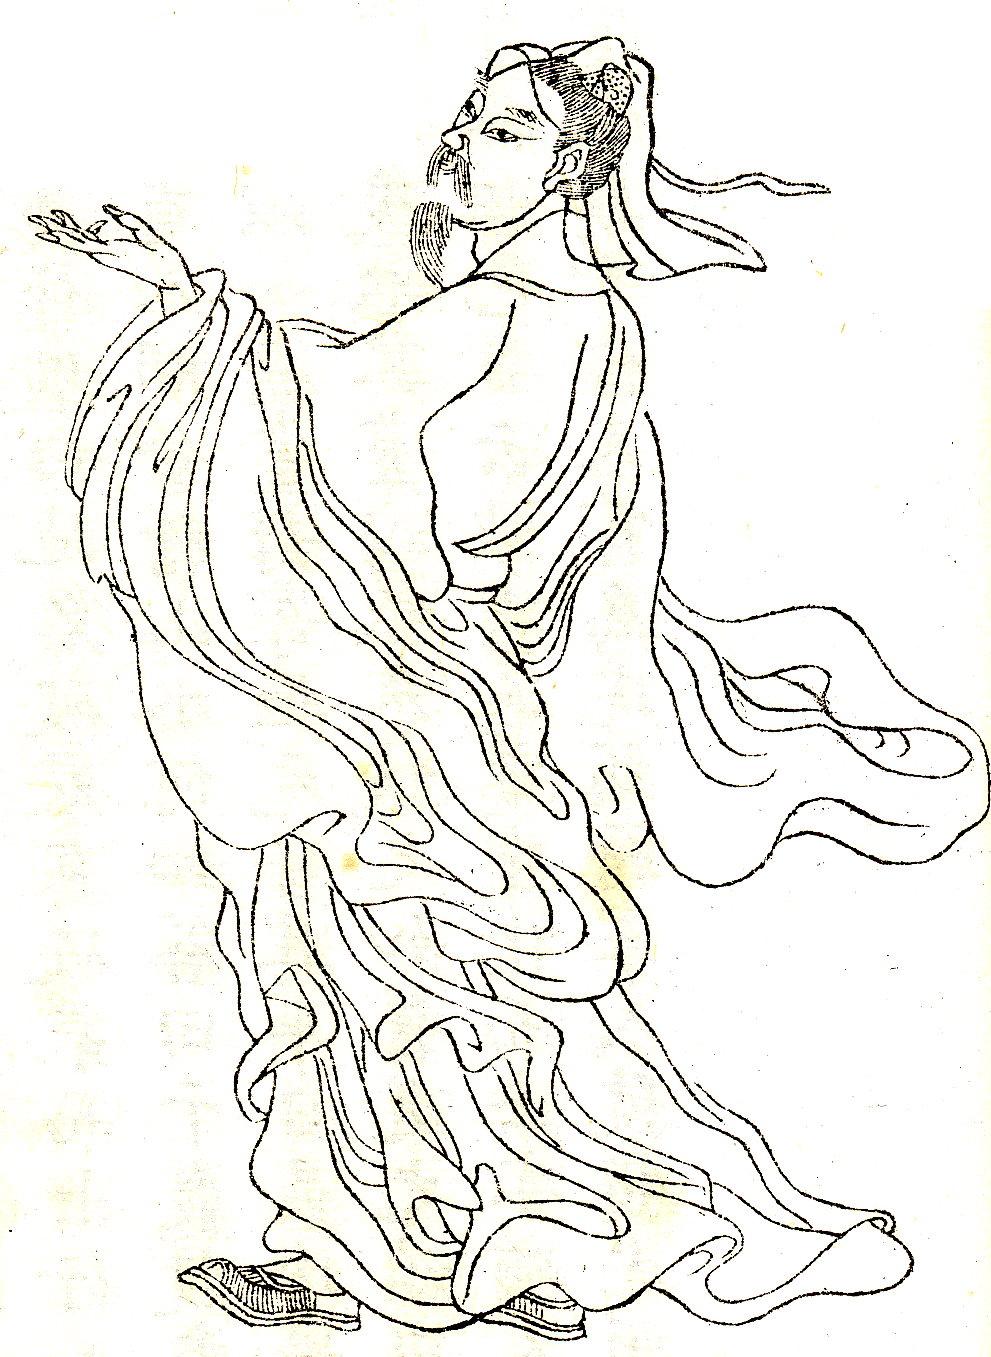 Gu Kaizhi Wikidata